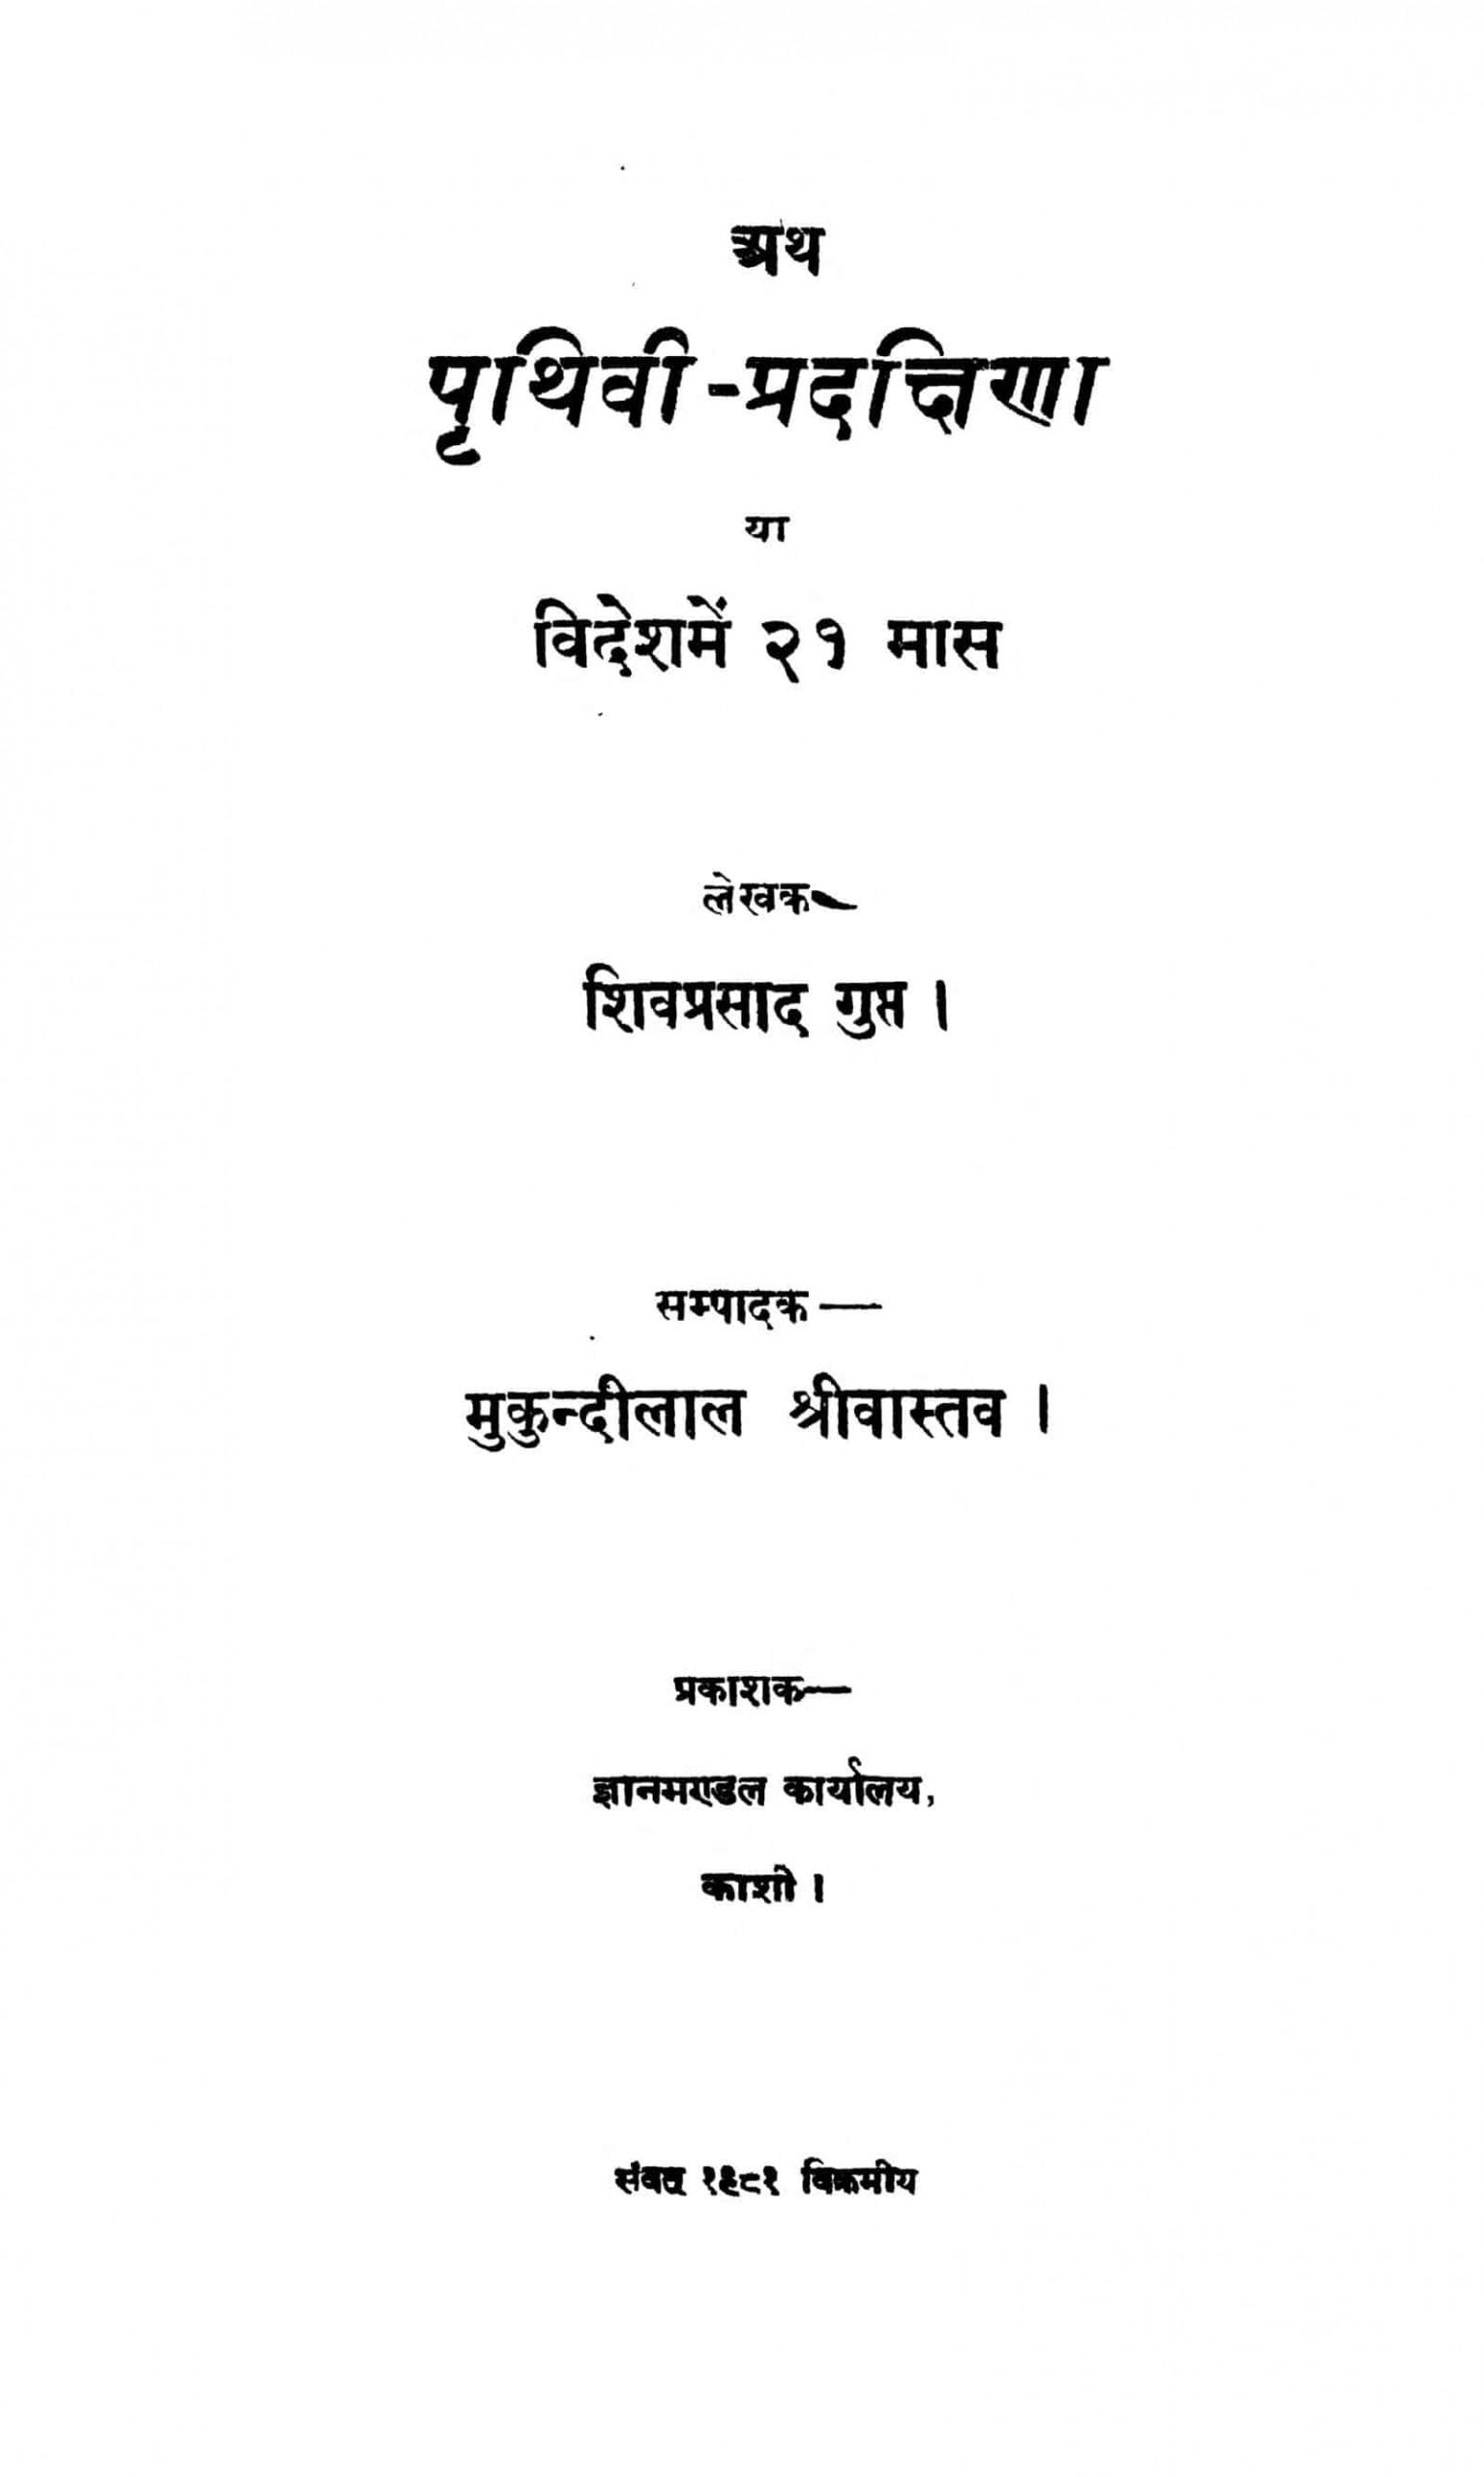 Book Image : अथ पृथिवी - प्रदक्षिणा  - Atha Prithivi-pradakshina